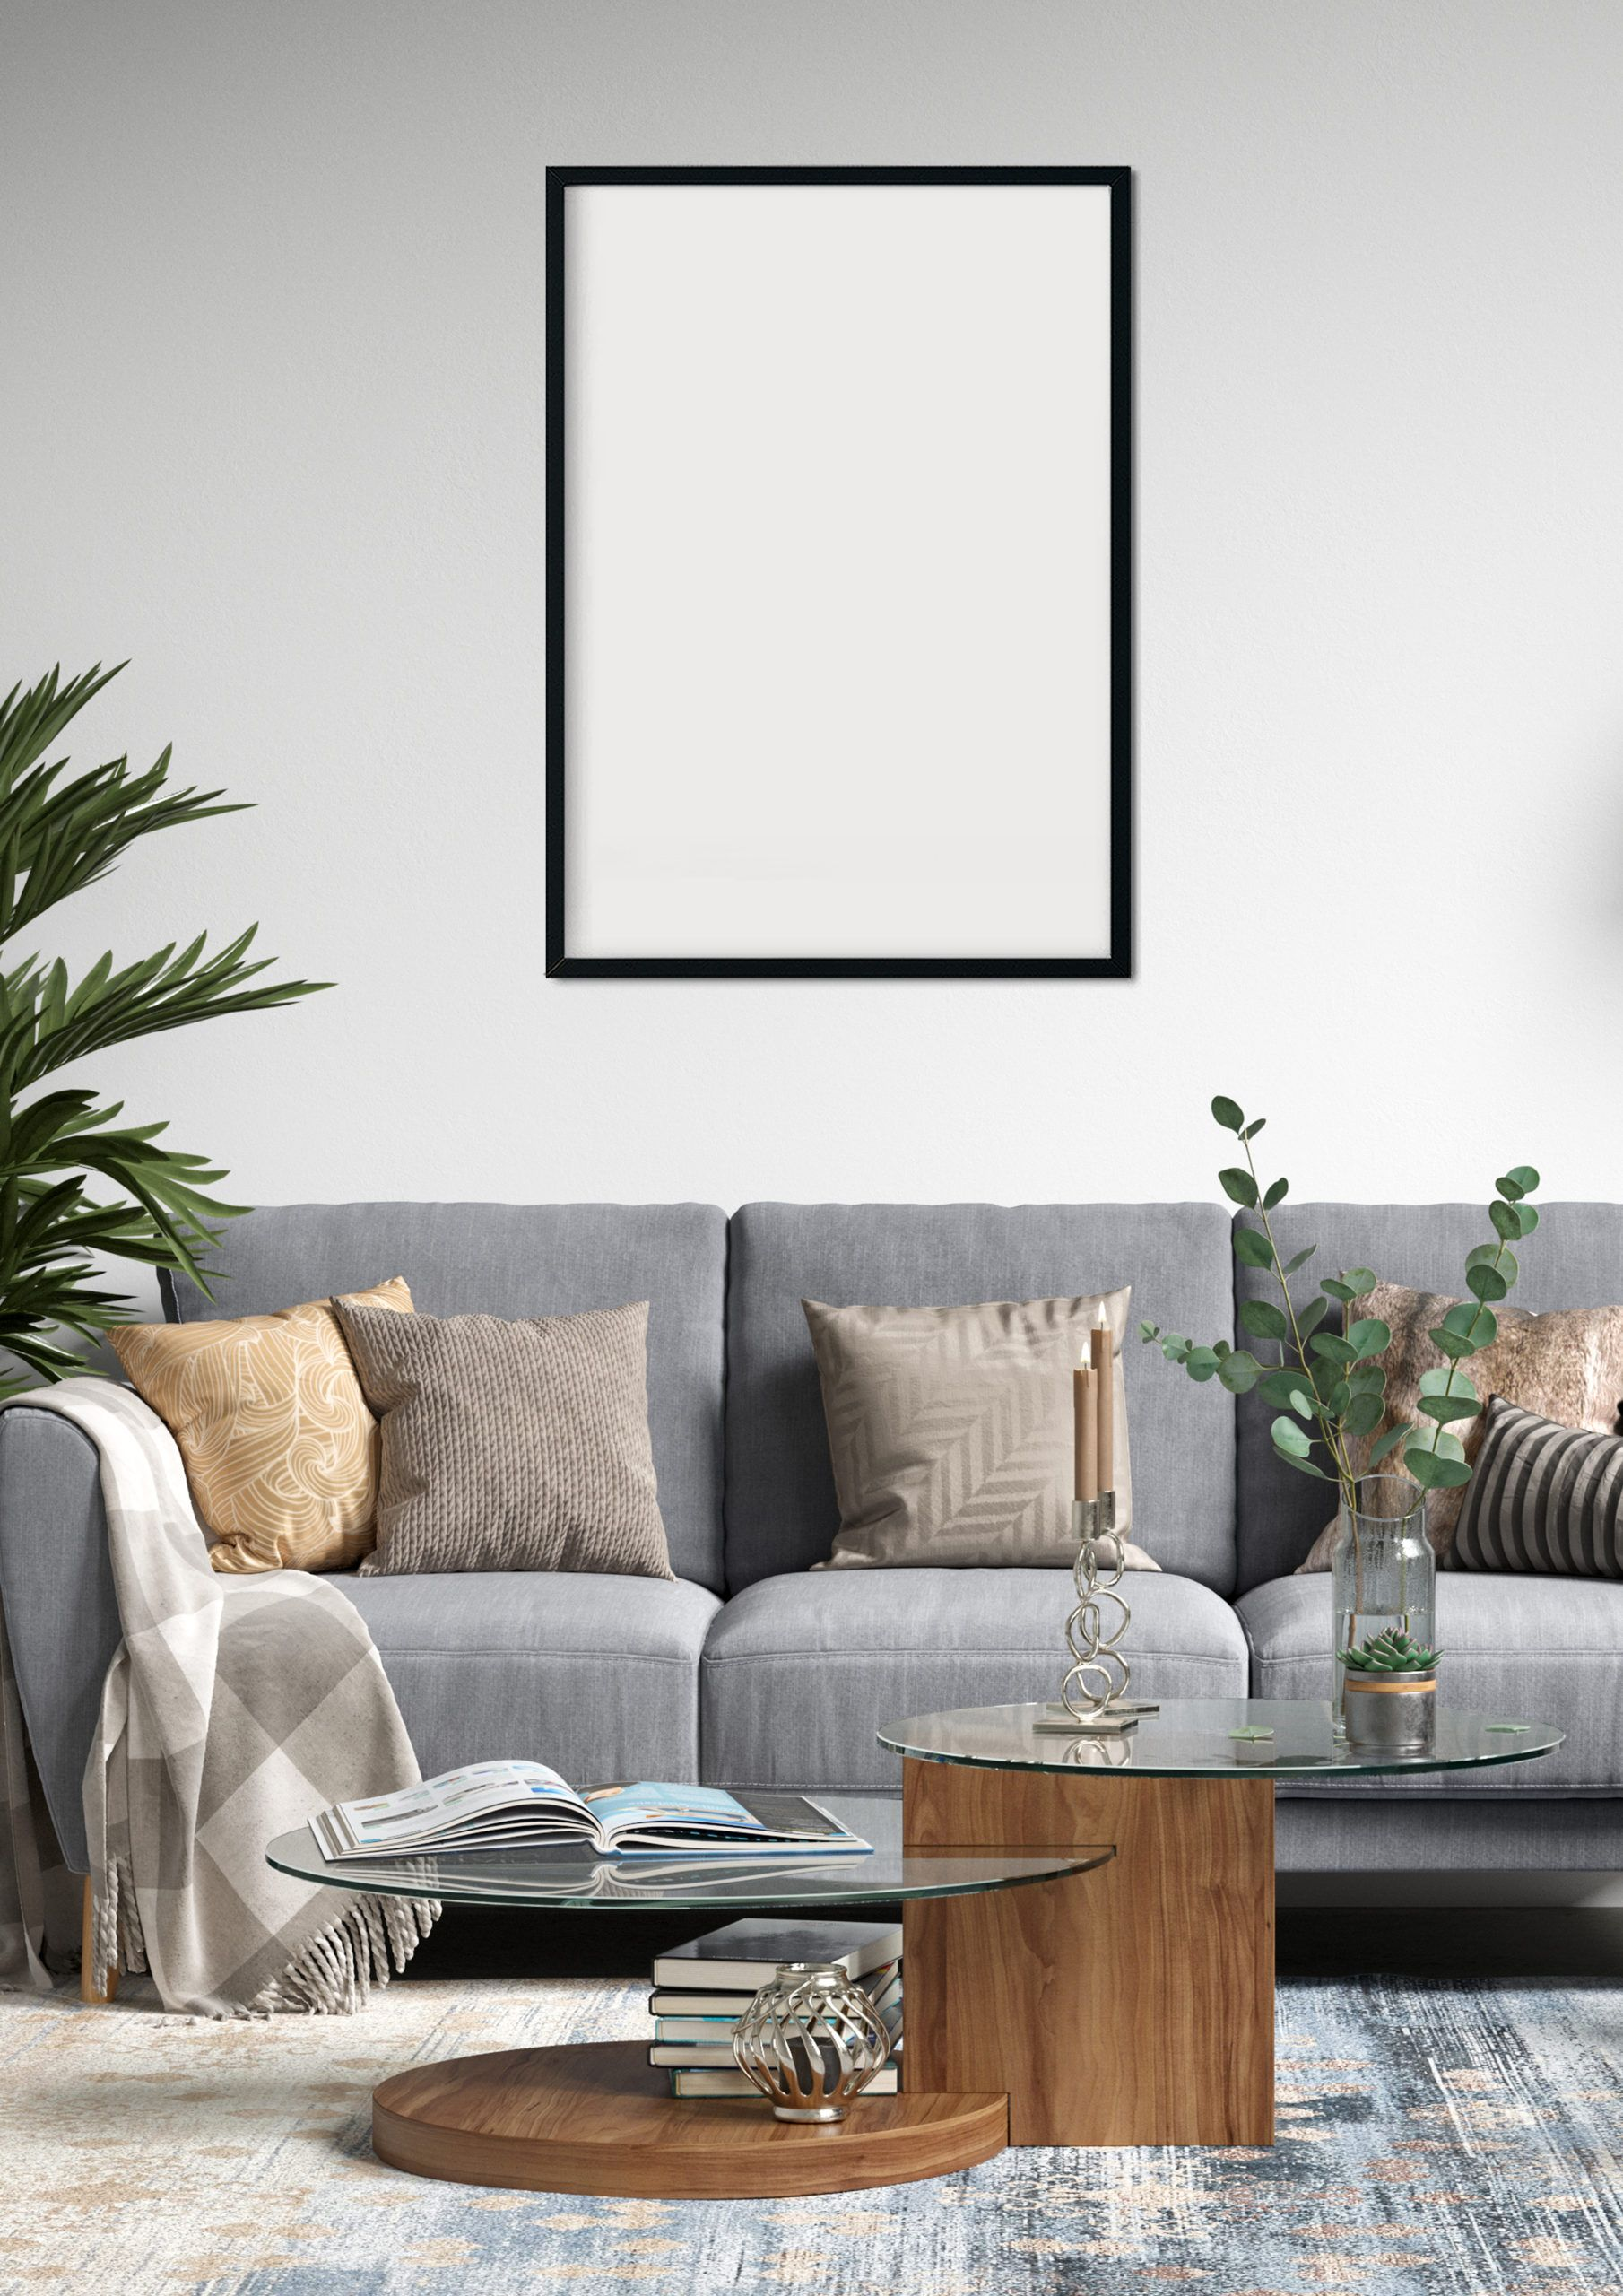 Pin By Fadhli Shabri On A3 Frame Mockup Home Decor Frame Mockups Decor View modern home decor living room png